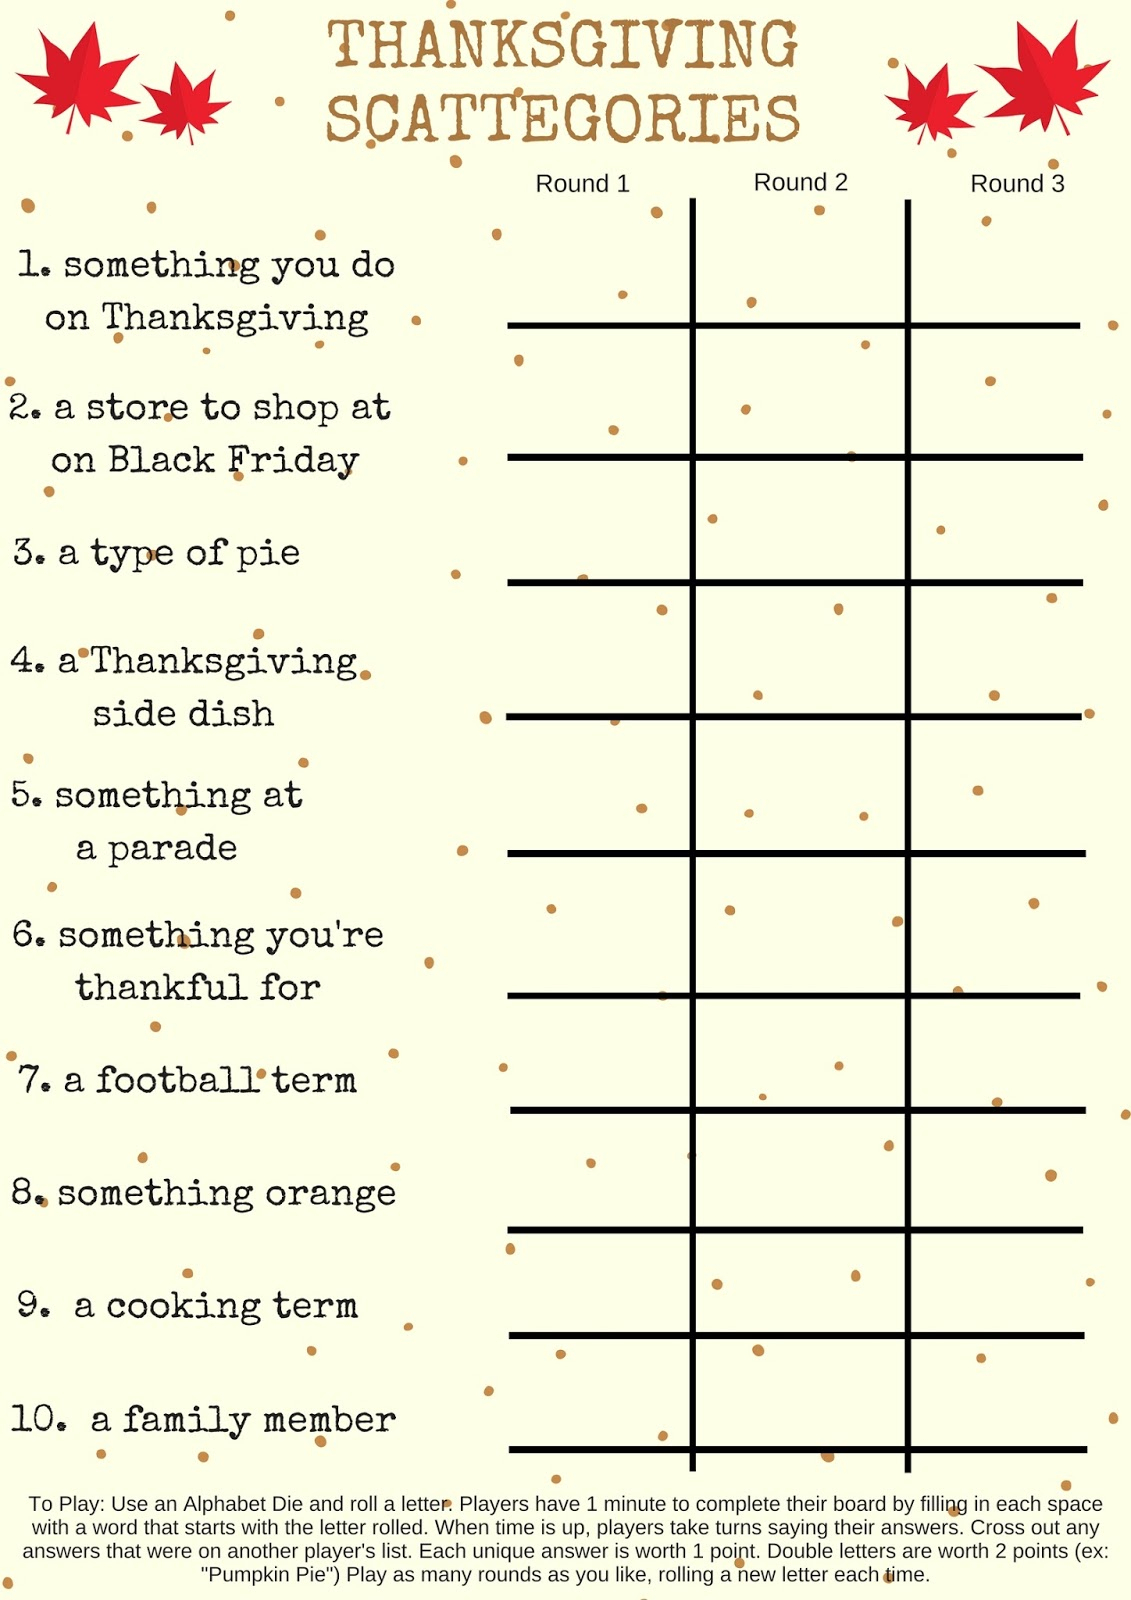 Savvy Spending: Free Printable: Thanksgiving Scattegories Game - Thanksgiving Games Printable Free